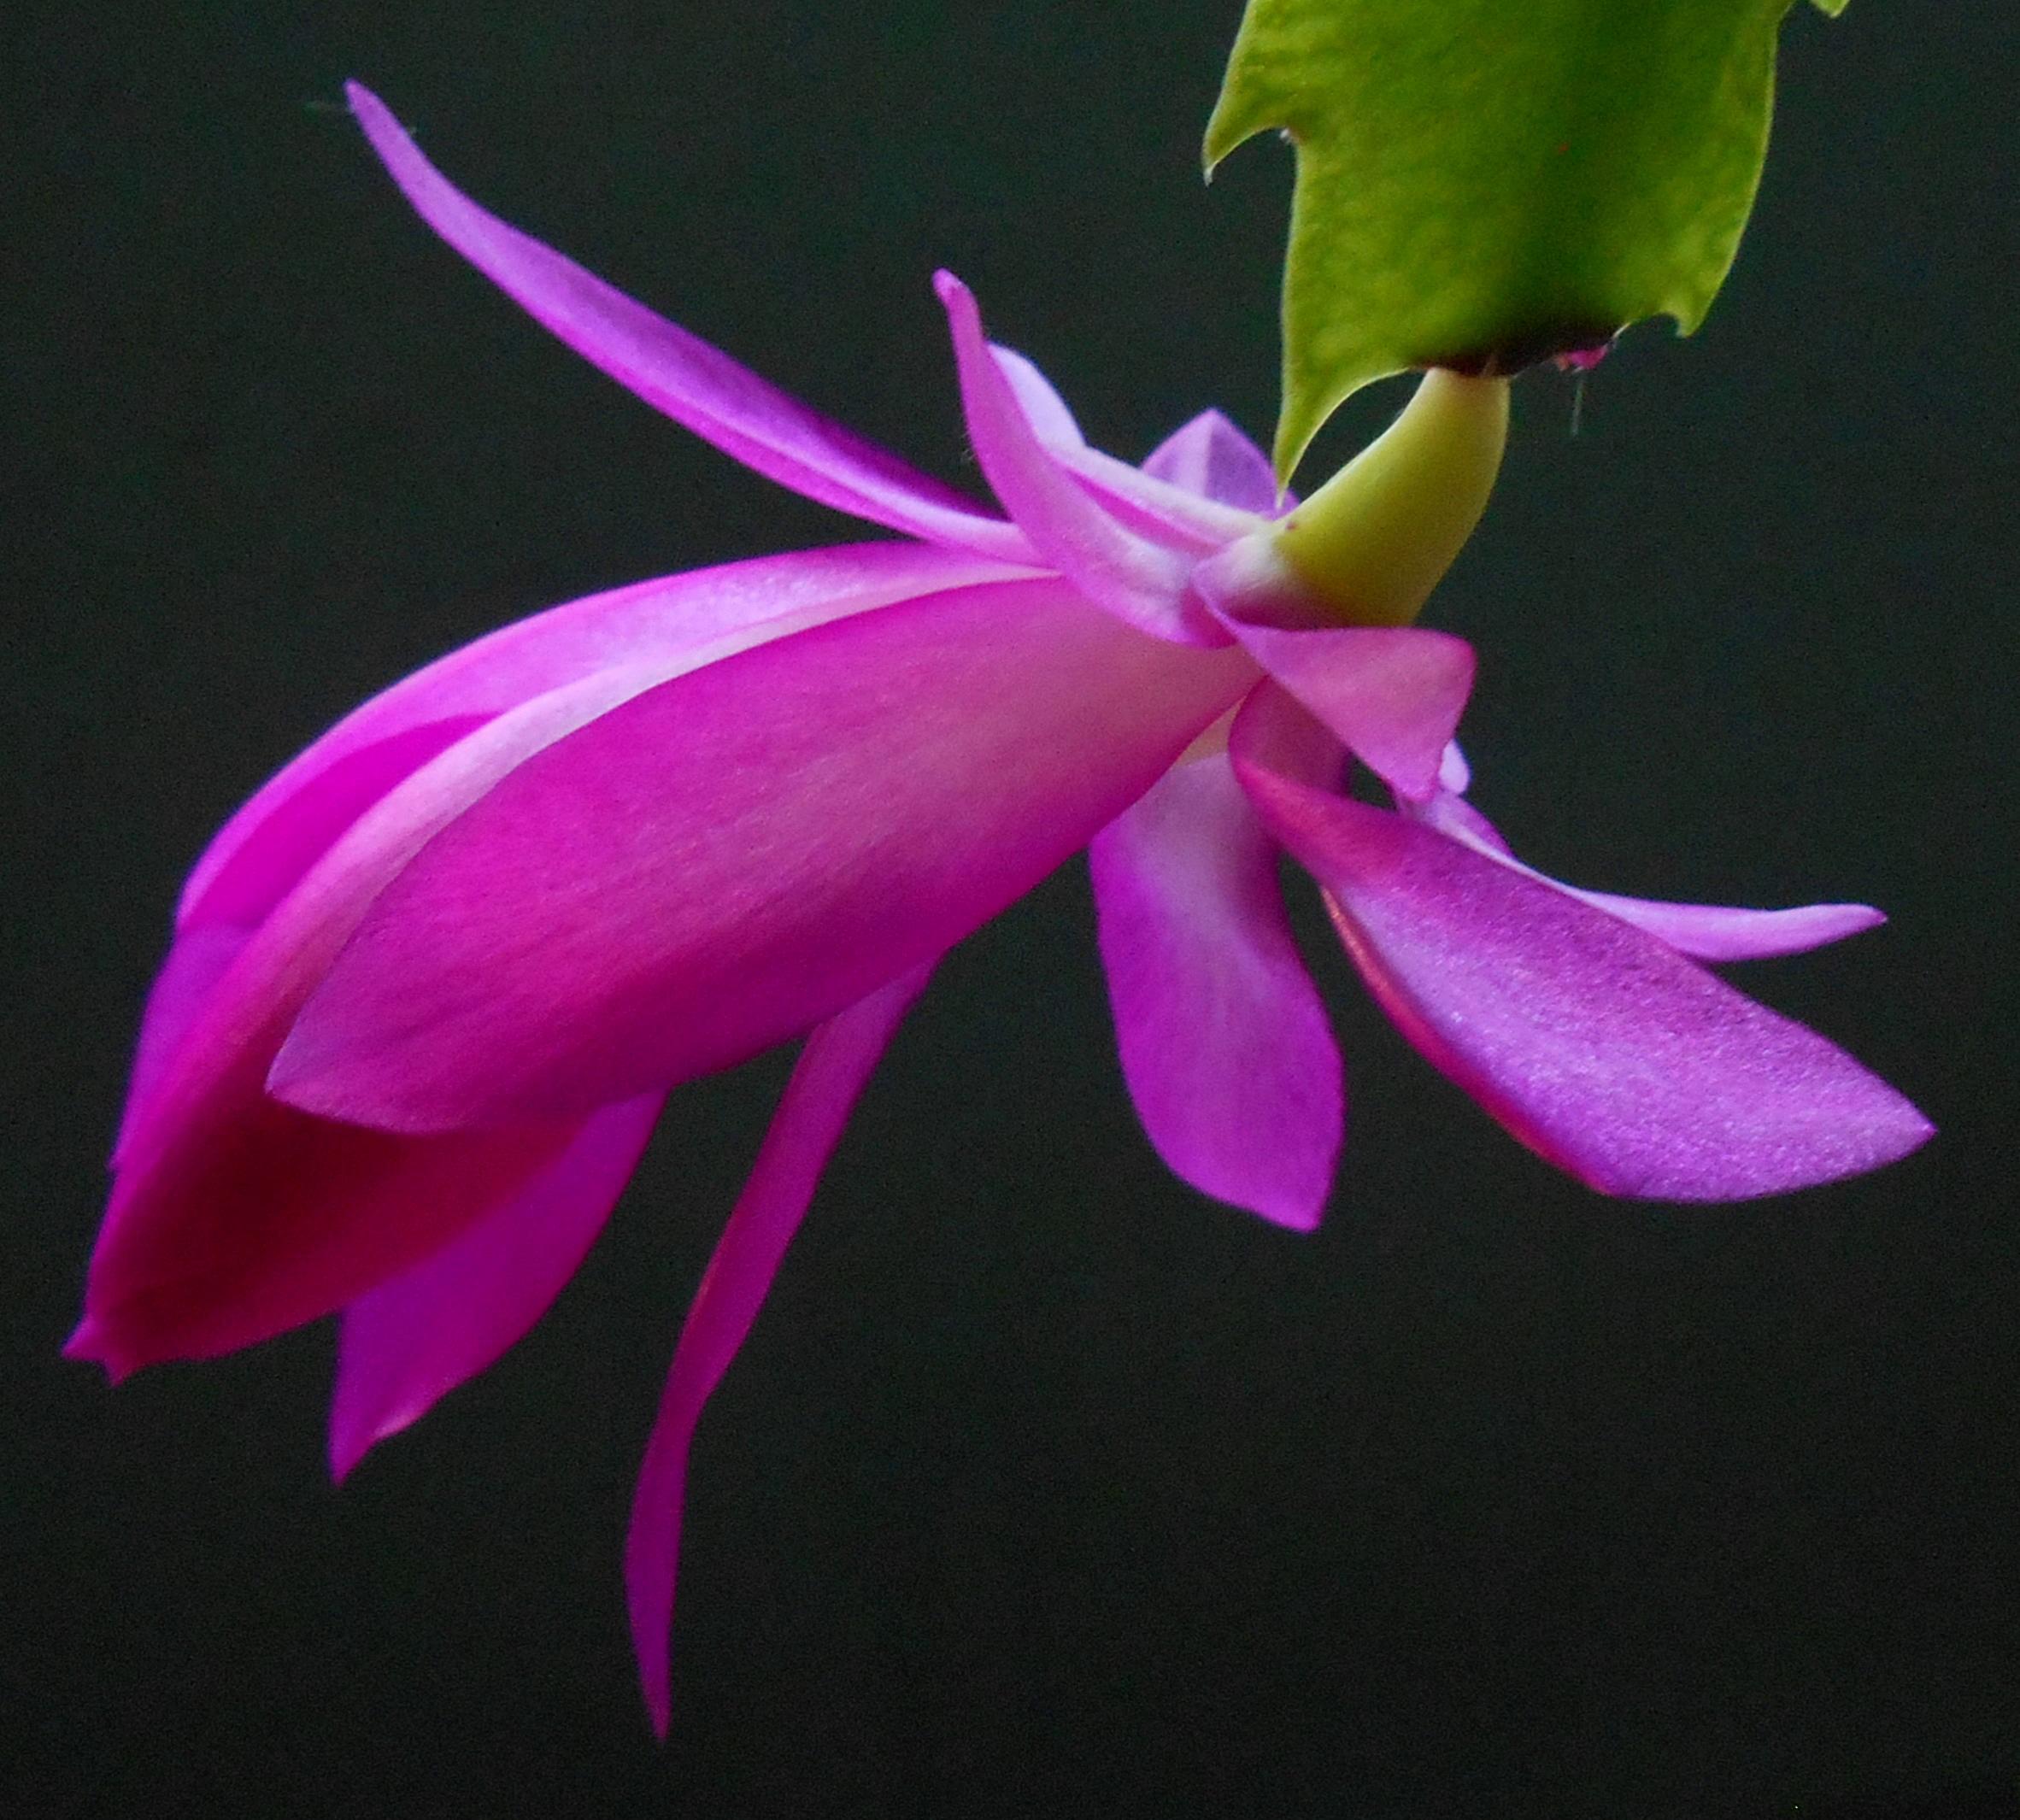 pink-blossom_833x751